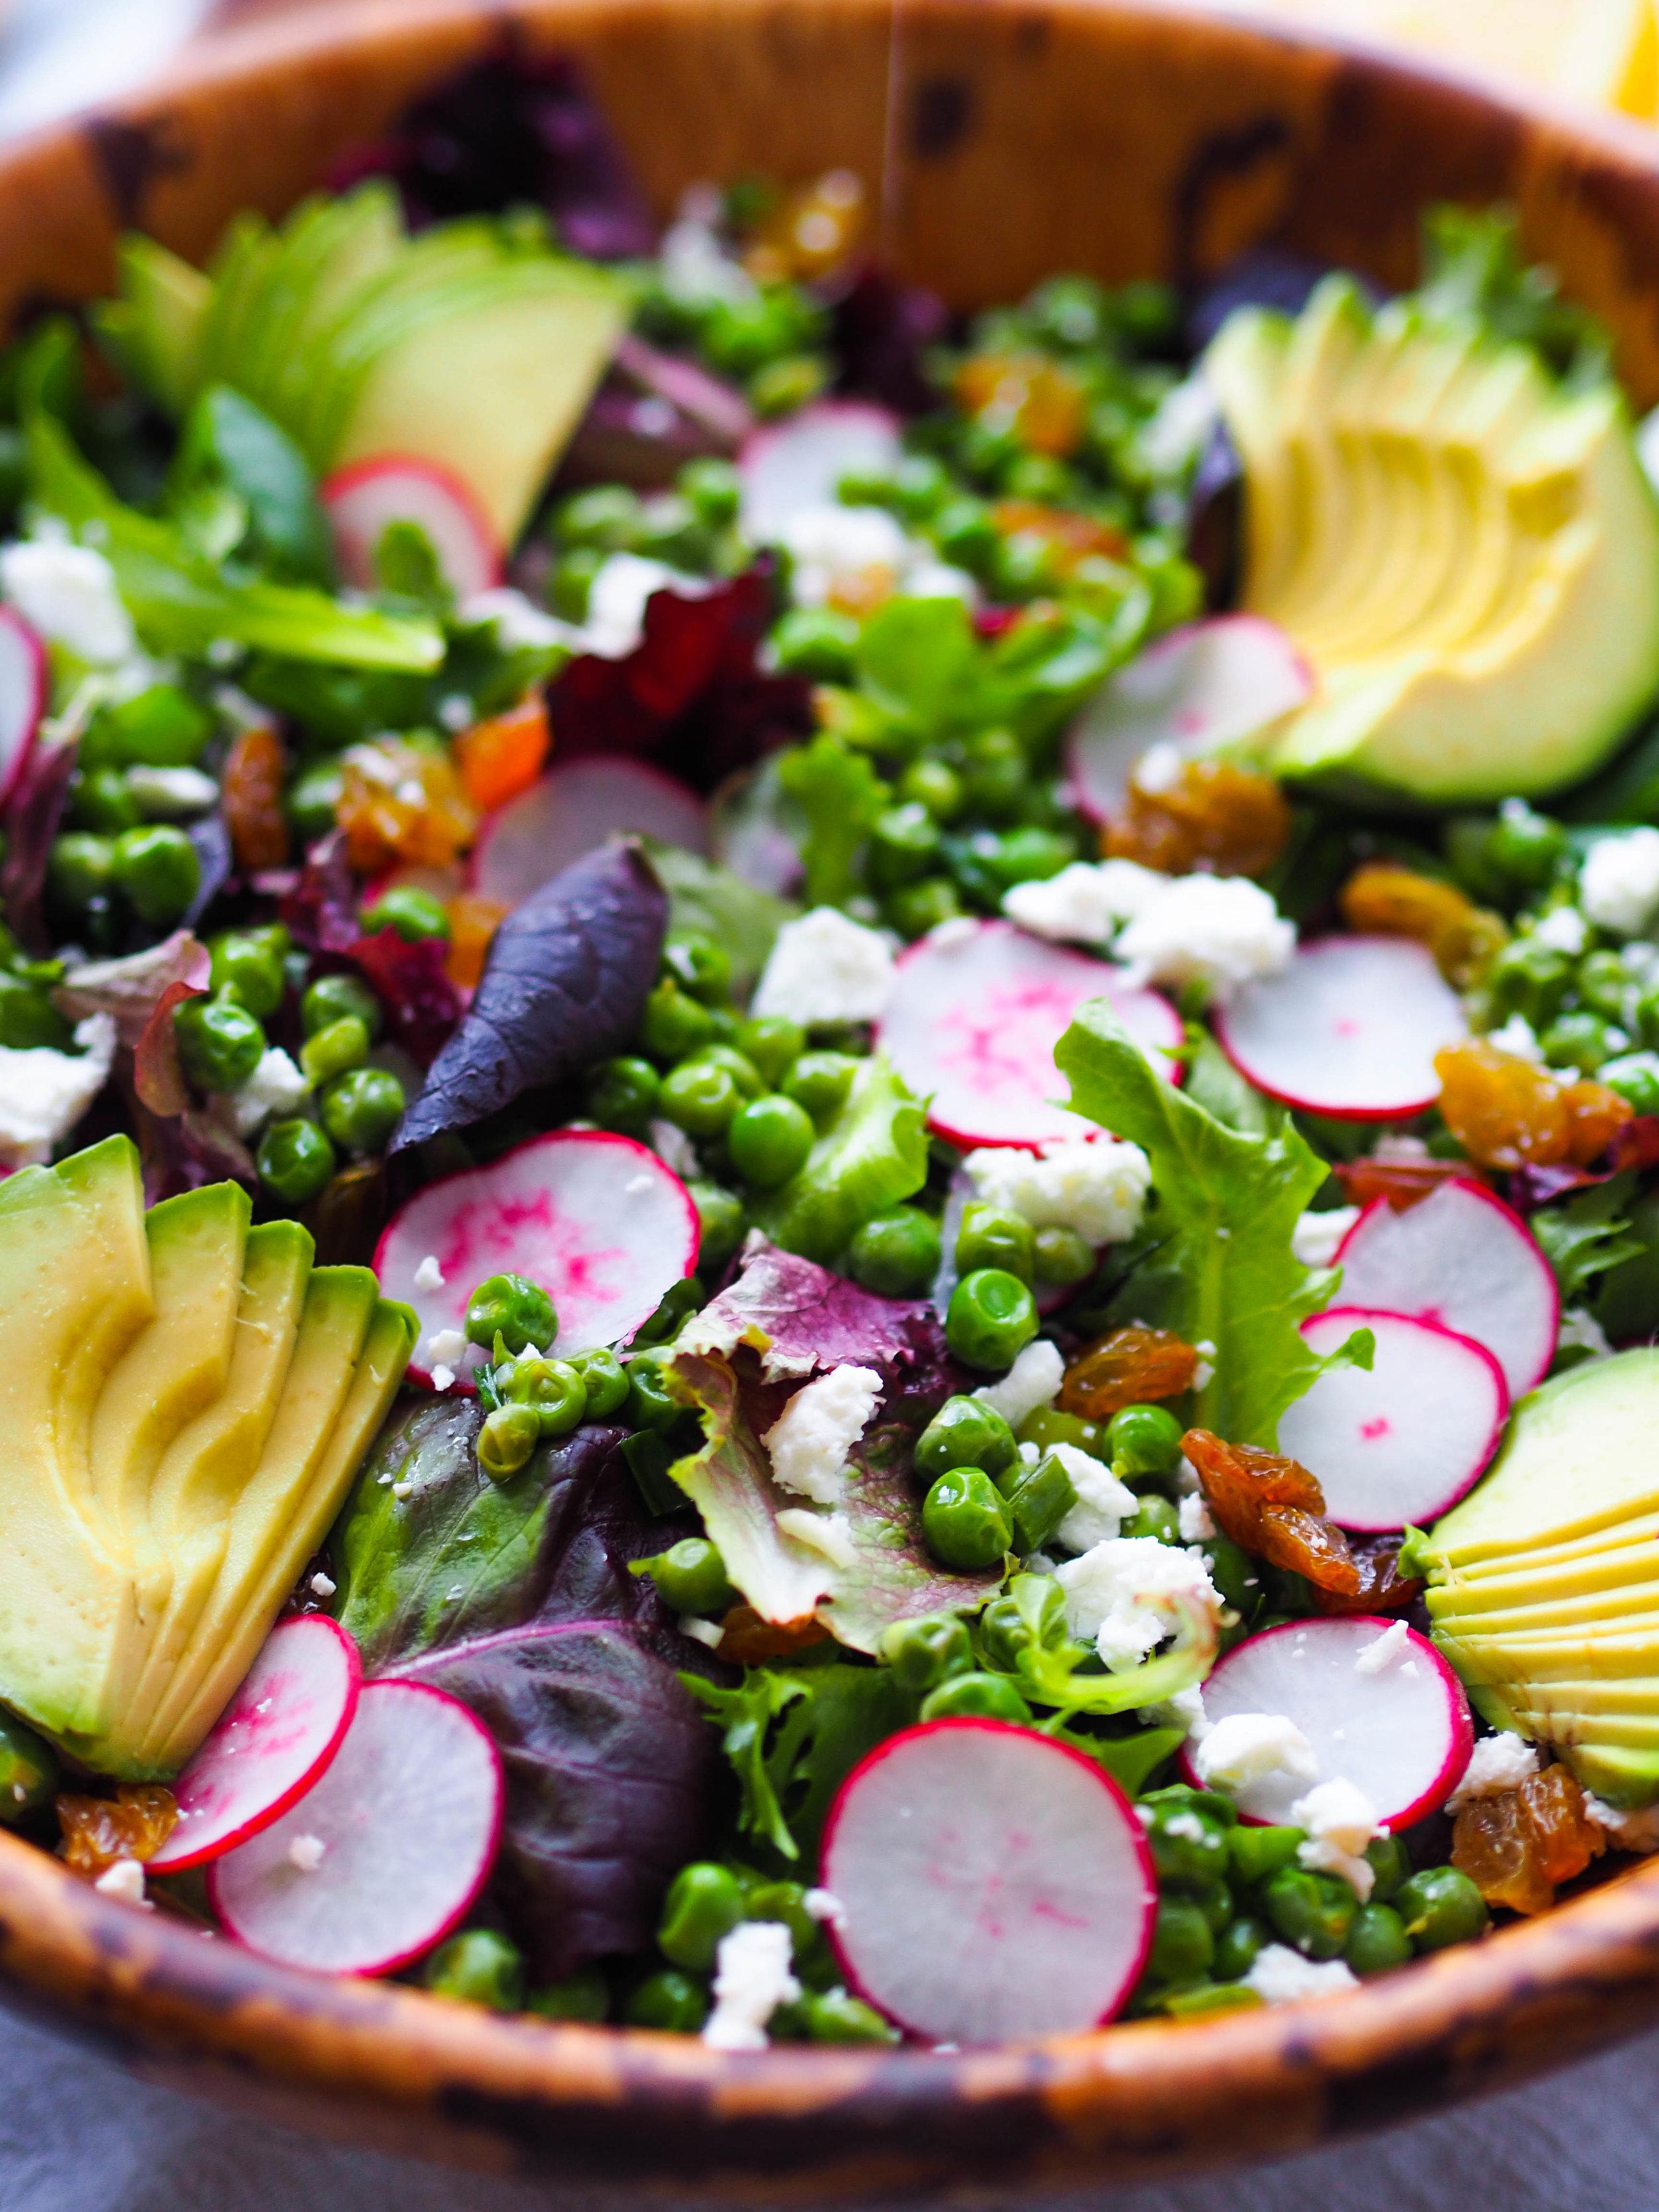 Spring Salad with Sauteed Peas and Scallions! #spring #seasonal #salad #healthyrecipe #avocado #springrecipe #glutenfree #vegetarian